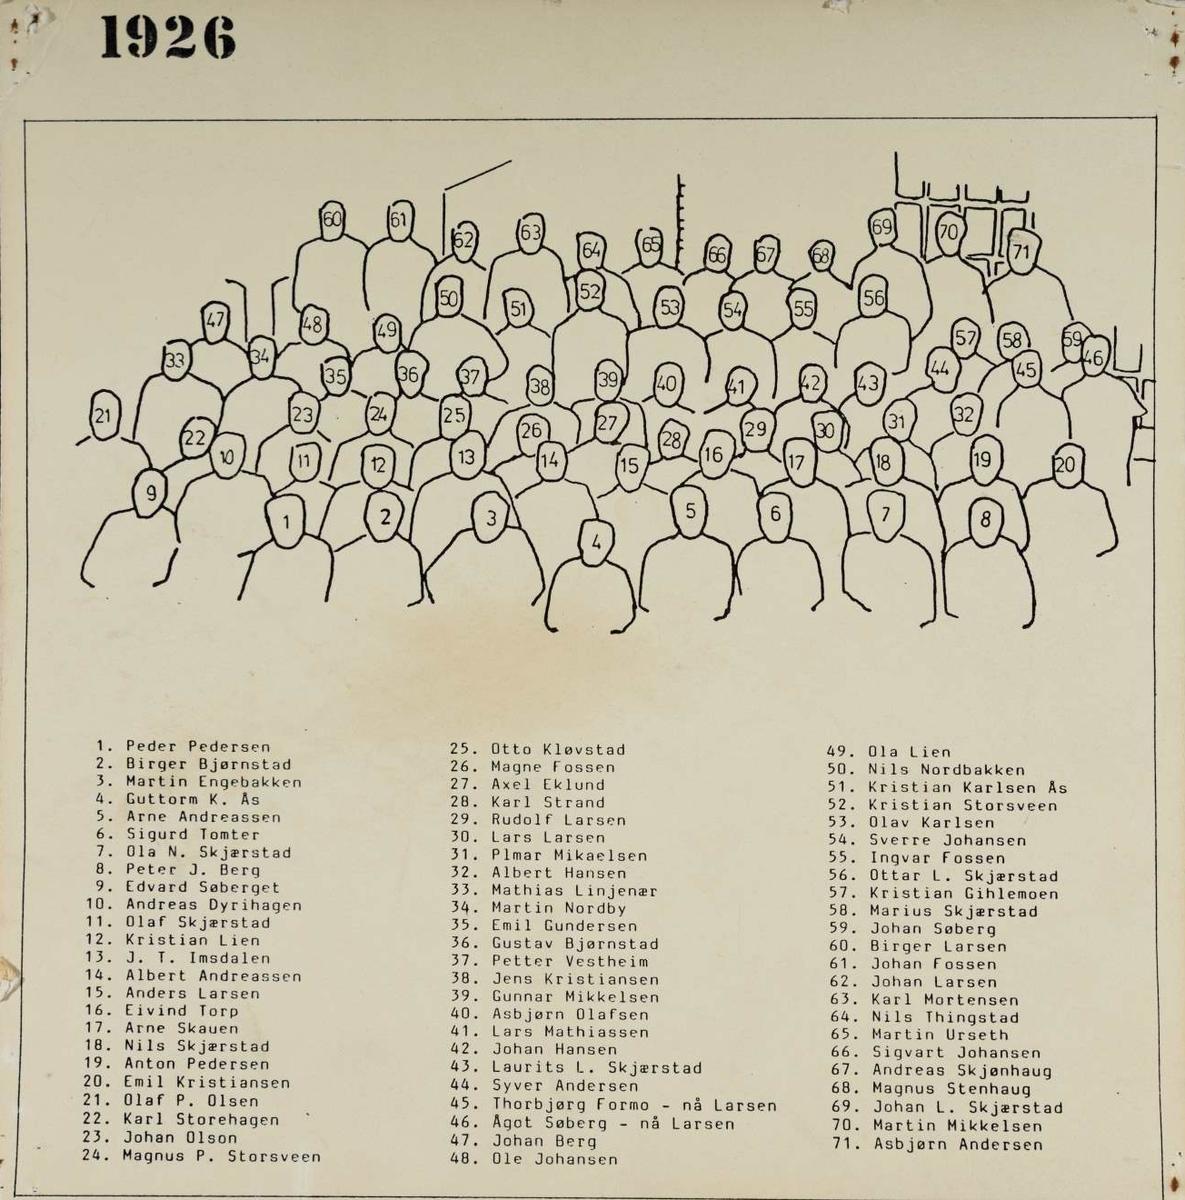 GR: 71 ARBEIDERE, KLEVFOS PAPIRFABRIKK, KLEVFOS CELLULOSE &PAPIRFABRIK A/S, ÅDALSBRUK Se Lautin 1976 side 153 for navn: side152. Dubb: 415-1810. 1. REKKE F. V. PEDER PEDERSEN, BIRGER BJØRNSTAD, MARTIN ENGEBAKKEN, GUTTORM K. ÅS, ARNE ANDREASSEN, SIGURD TOMTER, OLA N. SKJÆRSTAD, PETER J. BERG. 2 REKKE F. V. EDVARD SØBERGET, ANDREAS DYRIHAGEN, OLAF SKJÆRSTAD, KRISTIAN LIEN, J. T. IMSDALEN, ALBERT ANDREASSEN, ANDERS LARSEN, EIVIND TORP, ARNE SKAUGEN, NILS SKJÆRSTAD, ANTON PEDERSEN, EMIL KRISTIANSEN. 3. REKKE F. V. OLAF P. OLSEN, KARL STOREHAGEN, JOHAN OLSON, MAGNUS P. STORSVEEN, OTTO KLØVSTAD, MAGNE FOSSEN, AXEL EKLUND, KARL STRAND, RUDOLF LARSEN, LARS LARSEN, POLMAR MIKAELSEN, ALBERT HANSEN, 4. REKKE F. V. MATHIAS LINJENÆR, MARTIN NORDBY, EMIL GUNDERSEN, GUSTAV BJØRNSTAD, PETTER VESTHEIM, JENS KRISTIANSEN, GUNNAR MIKKELSEN, ASBJØRN OLAFSEN, LARS MATHIASSEN, JOHAN HANSEN, LAURITS L. SKJÆRSTAD, SYVER ANDERSEN, TORBJØRG FORMO G. LARSEN, ÅGOT SØBERG G. LARSEN. 5. REKKE F. V. JOHAN BERG, OLE JOHANSEN, OLA LIEN, NILS NORDBAKKEN, KRISTIAN KARLSEN ÅS, KRISTIAN STORSVEEN, OLAV KARLSEN, SVERRE JOHANSEN, INGVAR FOSSEN, OTTAR L. SKJÆRSTAD, KRISTIAN GIHLEMOEN, MARIUS SKJÆRSTAD, JOHAN SØBERG. 6. REKKE F. V. BIRGER LARSEN, JOHAN FOSSEN, JOHAN LARSEN, KARL MORTENSSEN, NILS THINGSTAD, MARTIN URSETH, SIGVART JOHANSEN, ANDREAS SKJØNHAUG, MAGNUS STENHAUG, JOHAN L. SKJÆRSTAD, MARTIN MIKKELSEN, ASBJØRN ANDERSEN.  Løten.